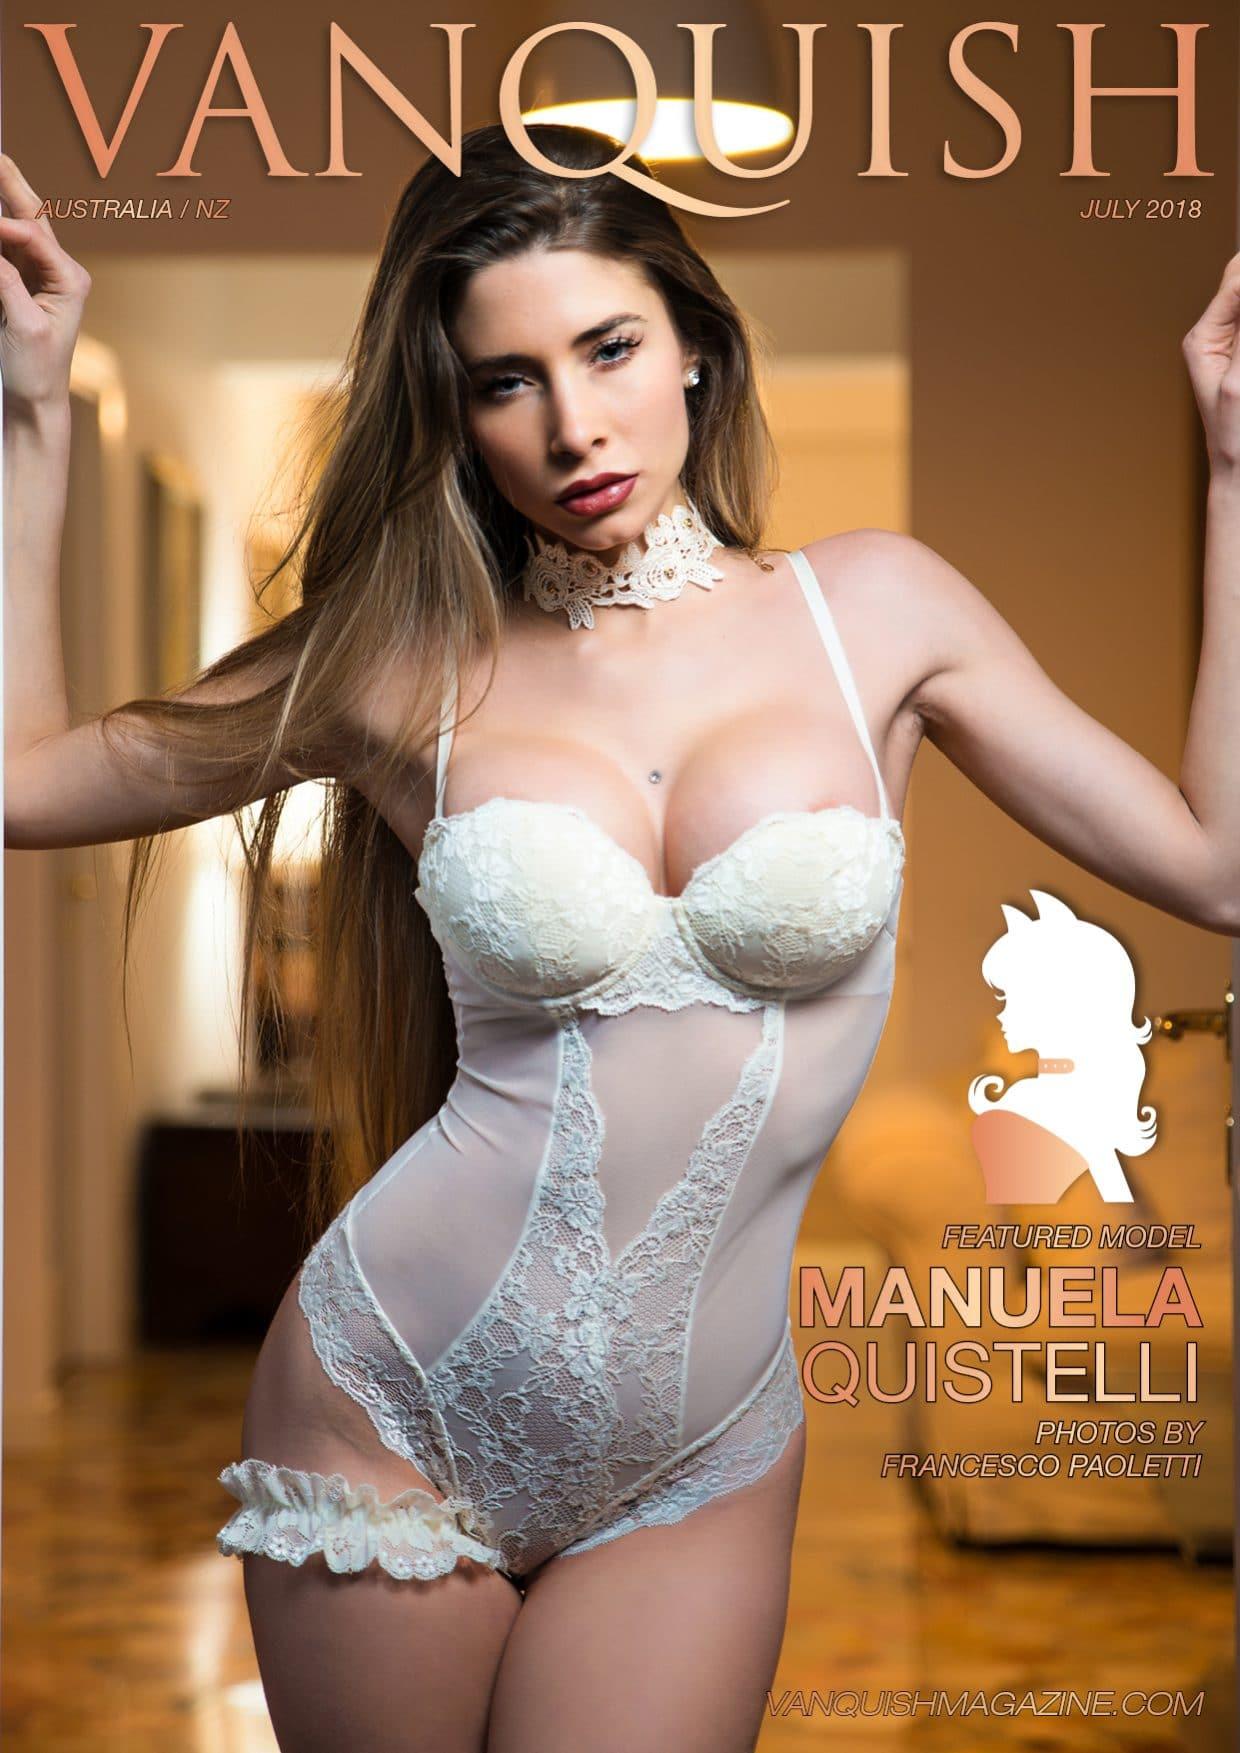 Vanquish Magazine - July 2018 - Manuela Quistelli 1